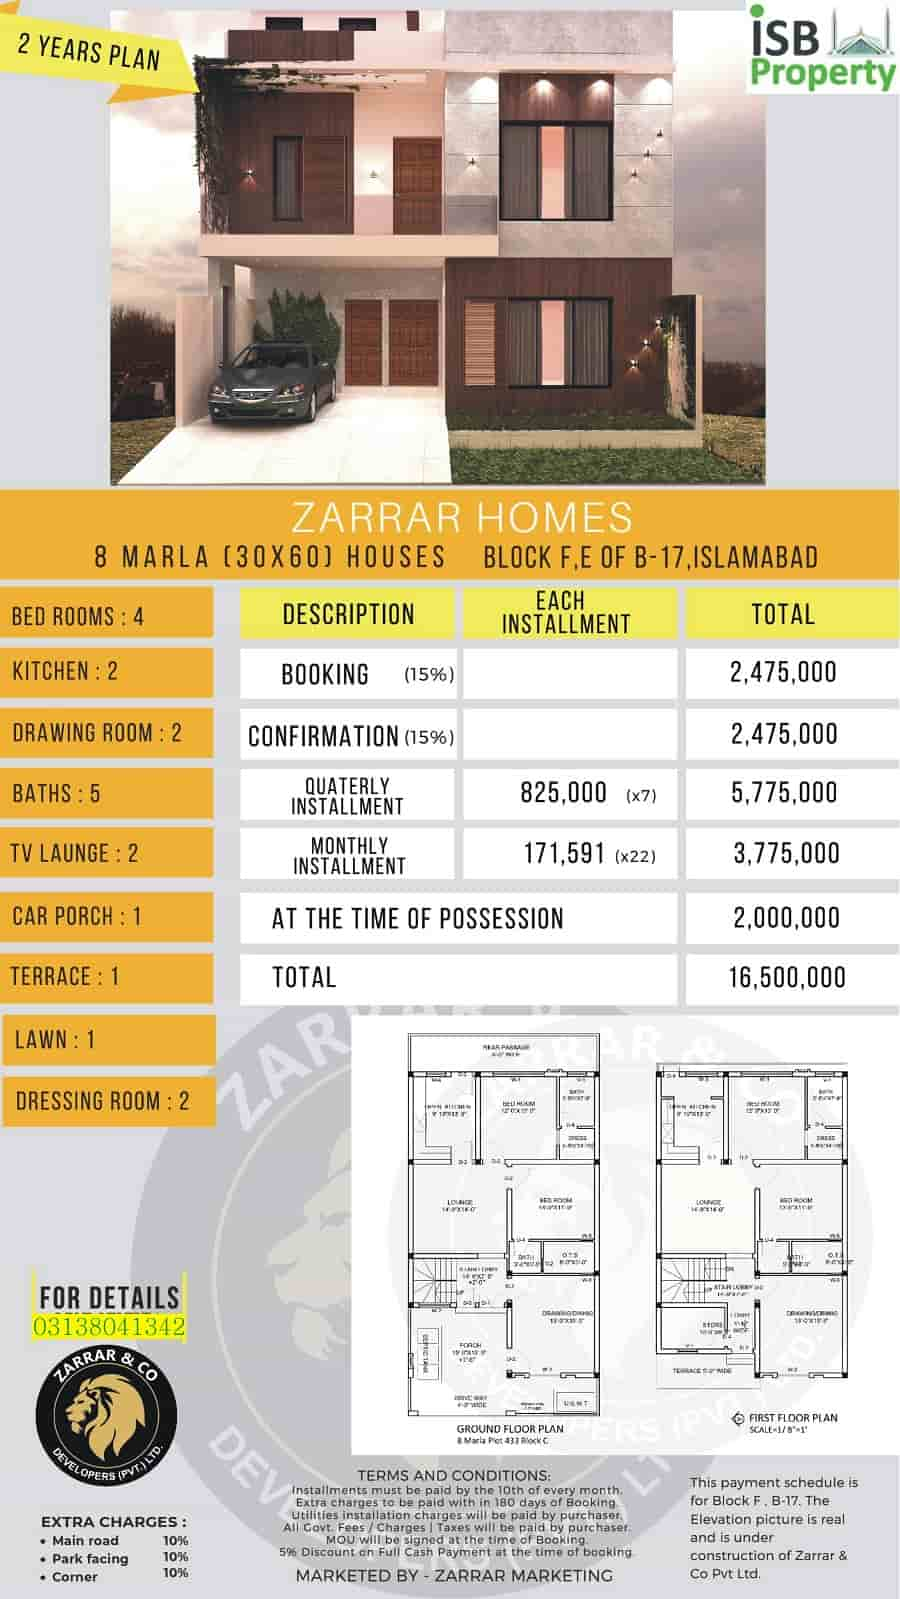 Zarar Homes 8 Marla 2 Years Plan 1